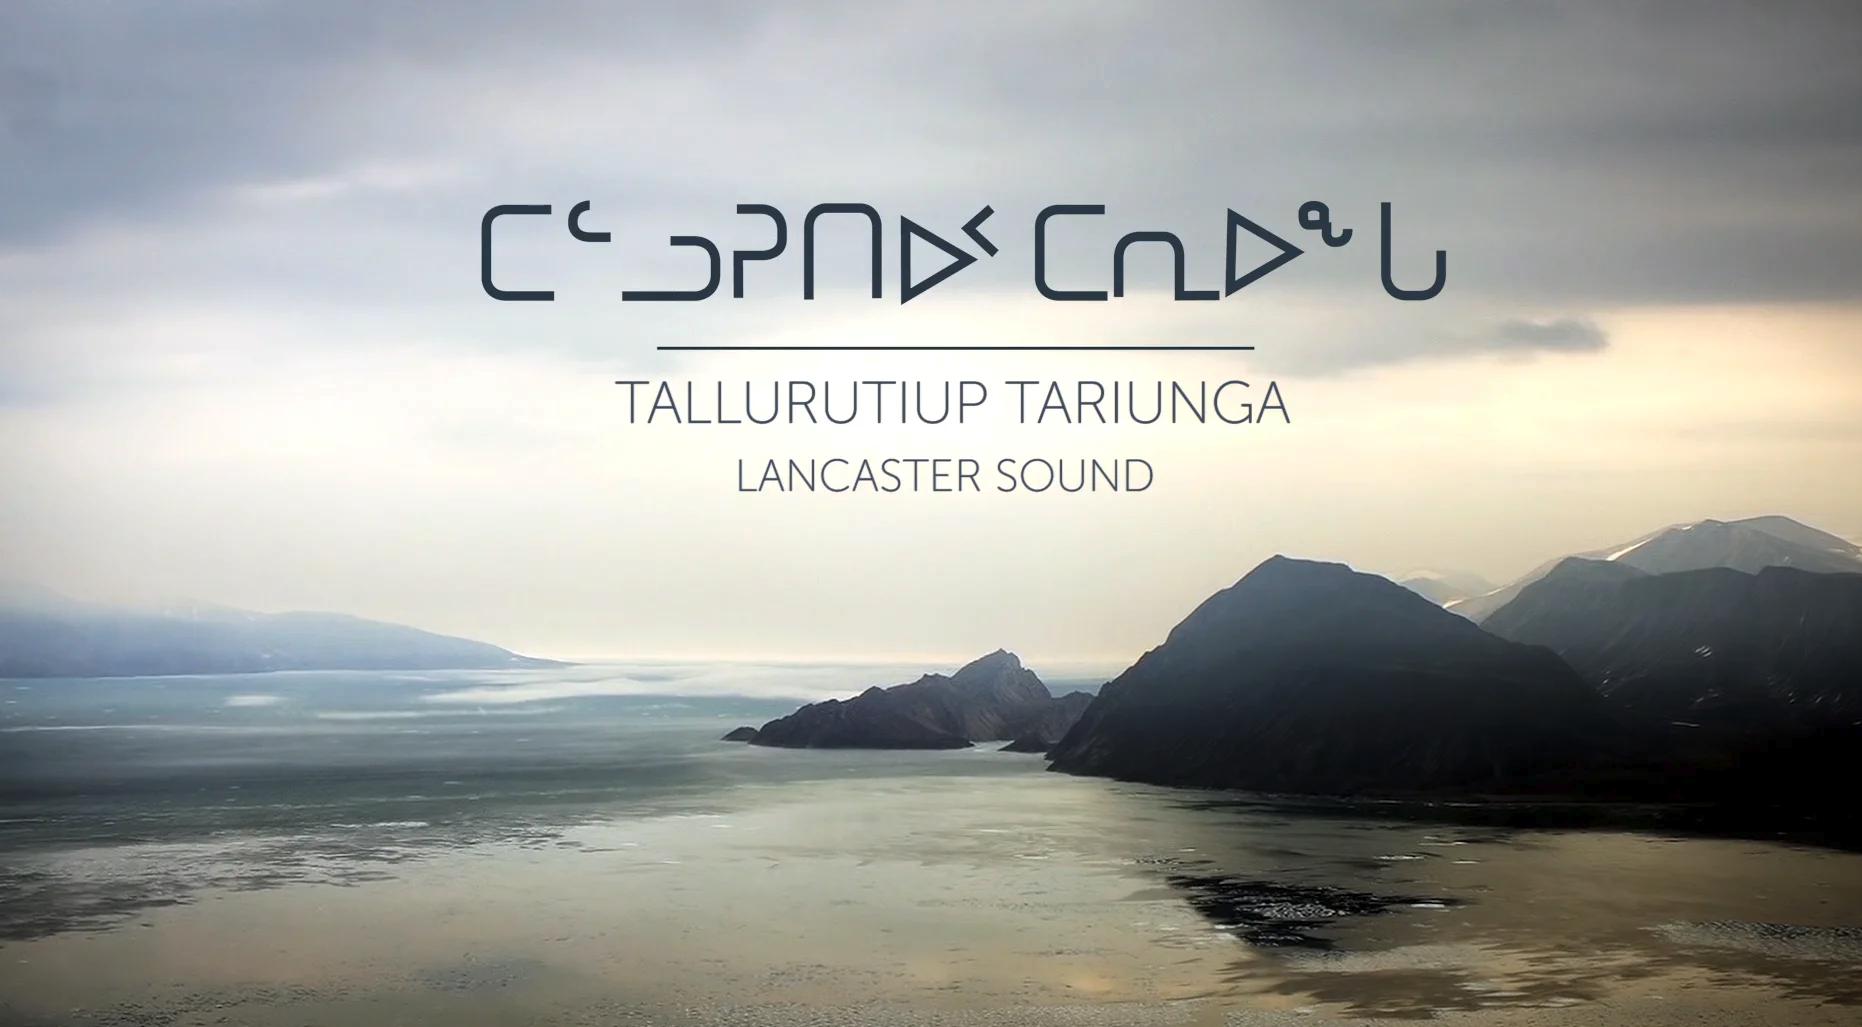 TALLURUTIUP TARIUNGA - Lancaster Sound